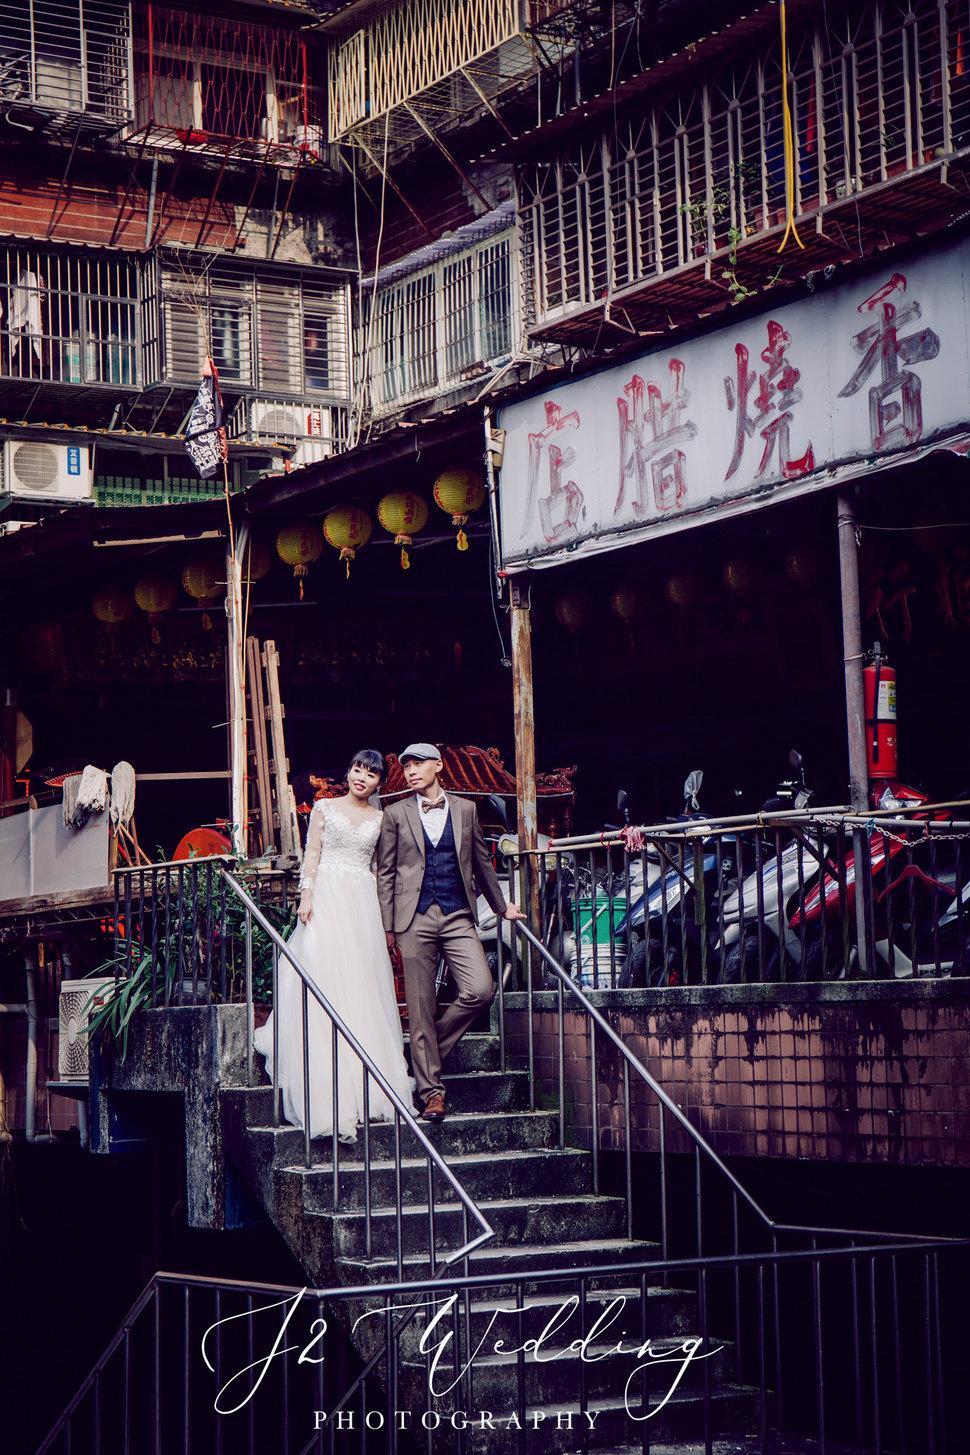 MAN_1899 - J2 wedding 板橋 中壢手工婚紗《結婚吧》